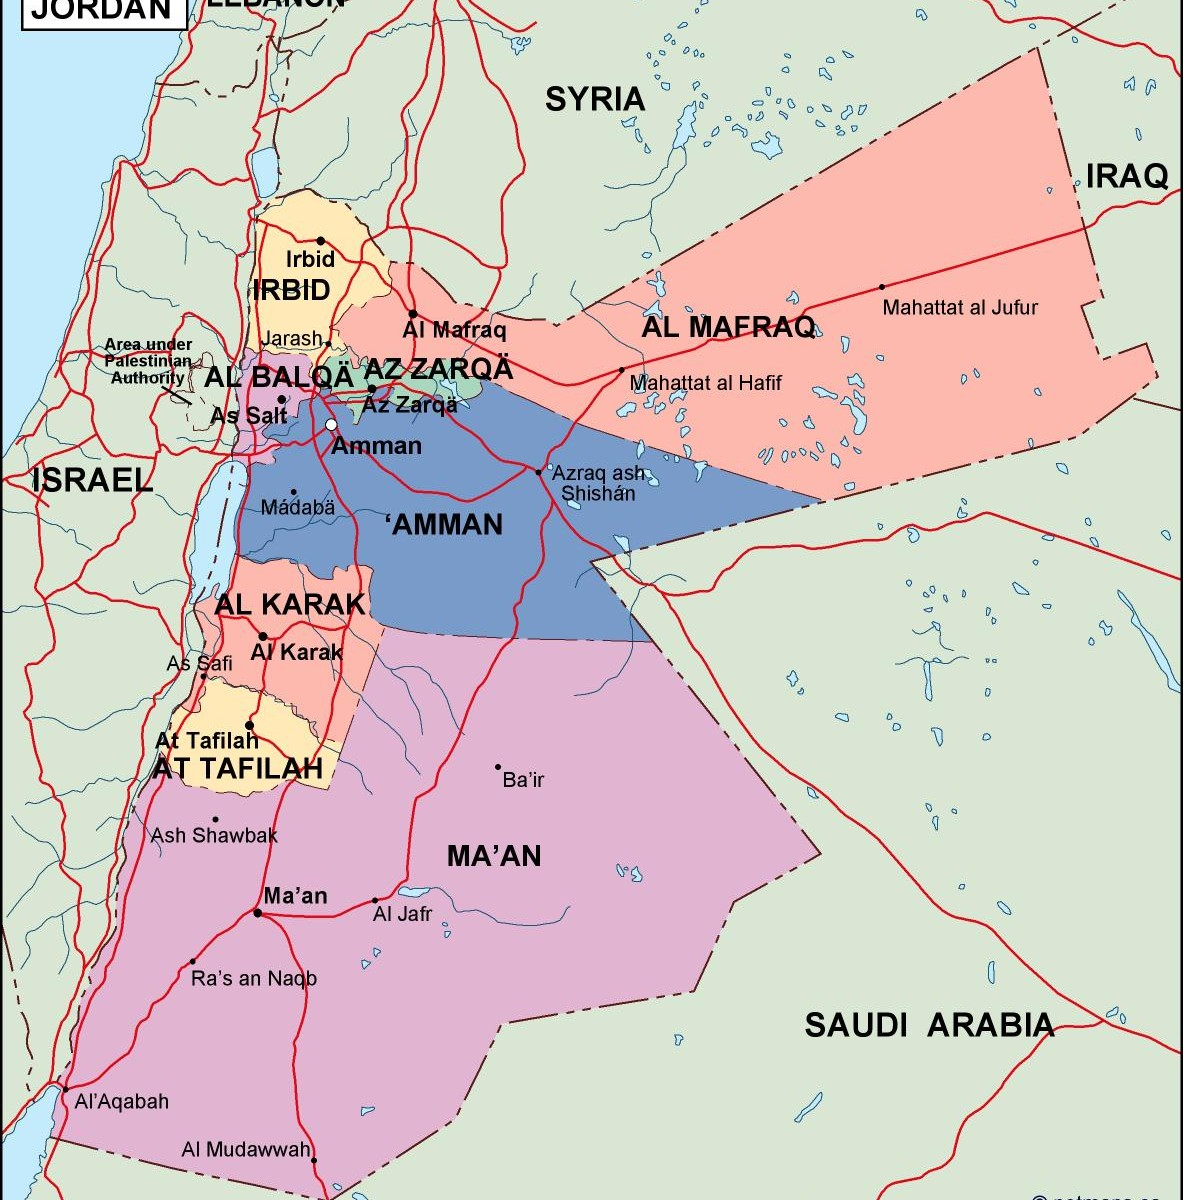 Jordan Political Map Eps Illustrator Map Our Cartographers Have - Map of jordan